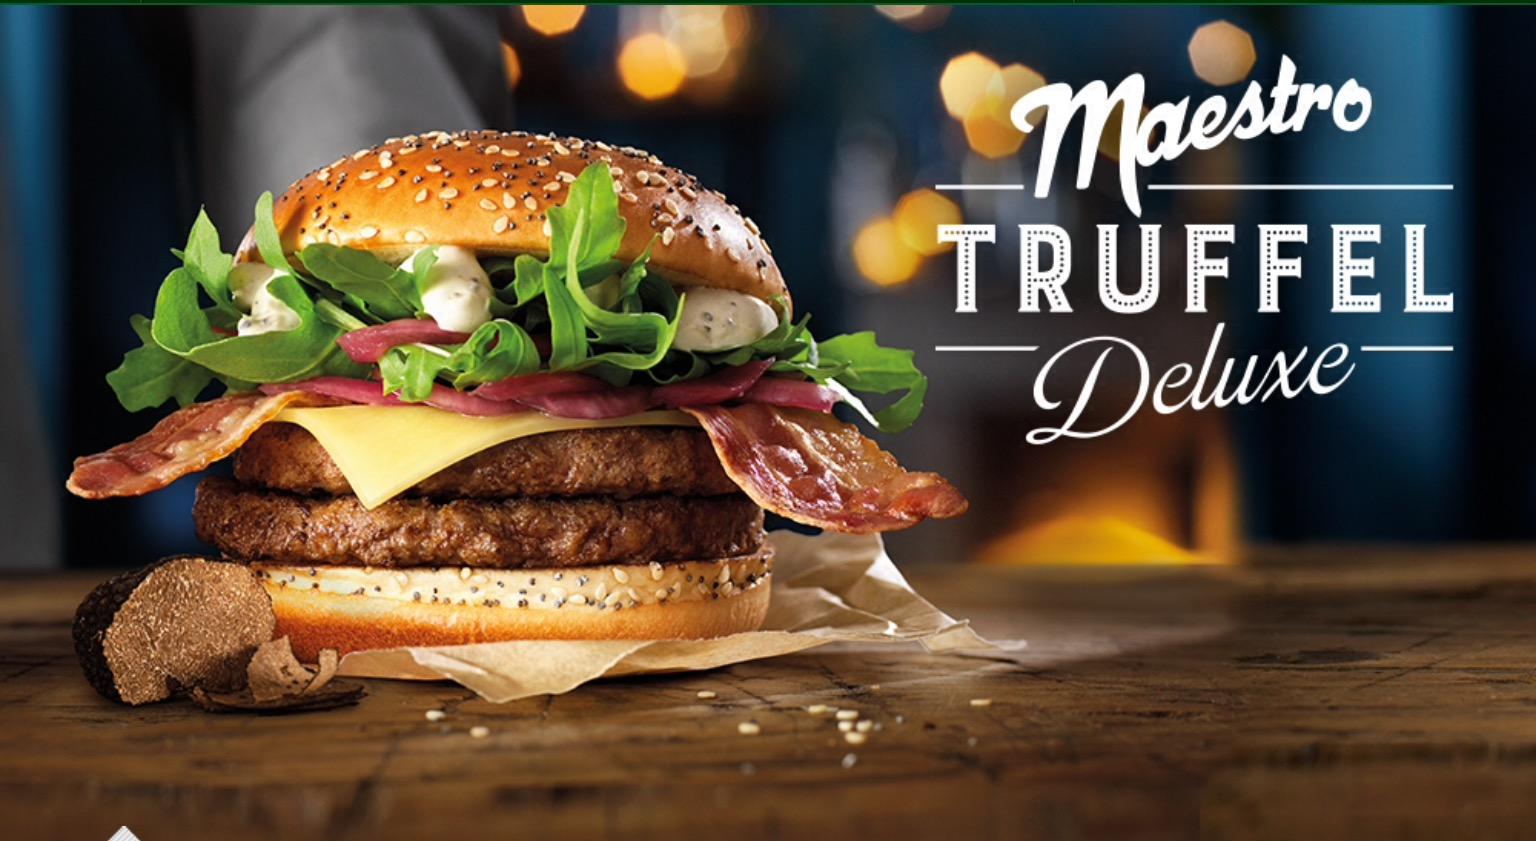 McDonald's Maestro Burgers - Holland - Truffel Deluxe